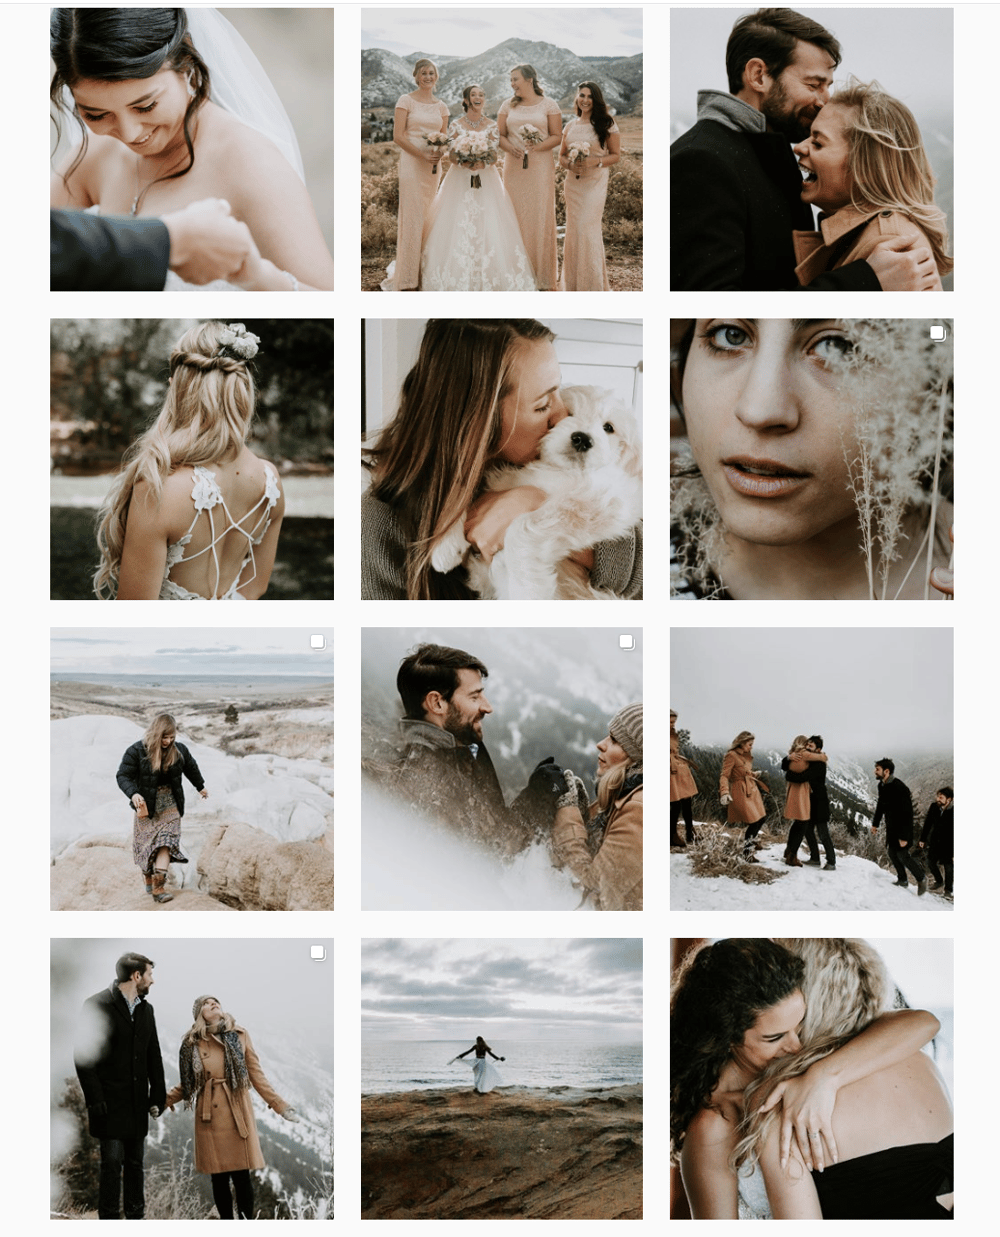 Colorado Wedding + Travel Photographer - image 3 - student project